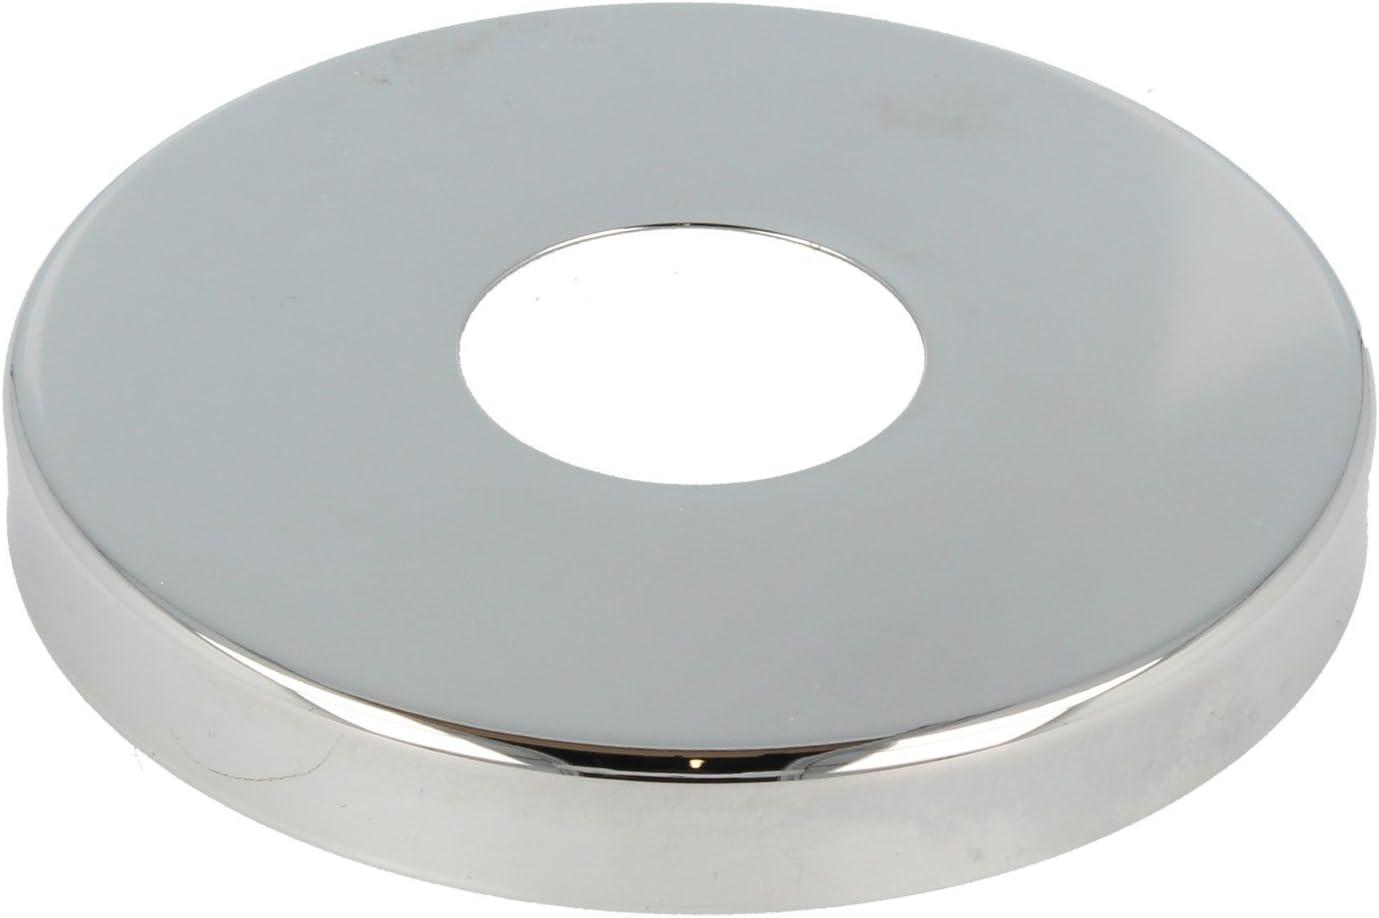 tecuro DESIGN-Hahnrosette bronze 3//4 Ø 27 mm x Ø 72 mm